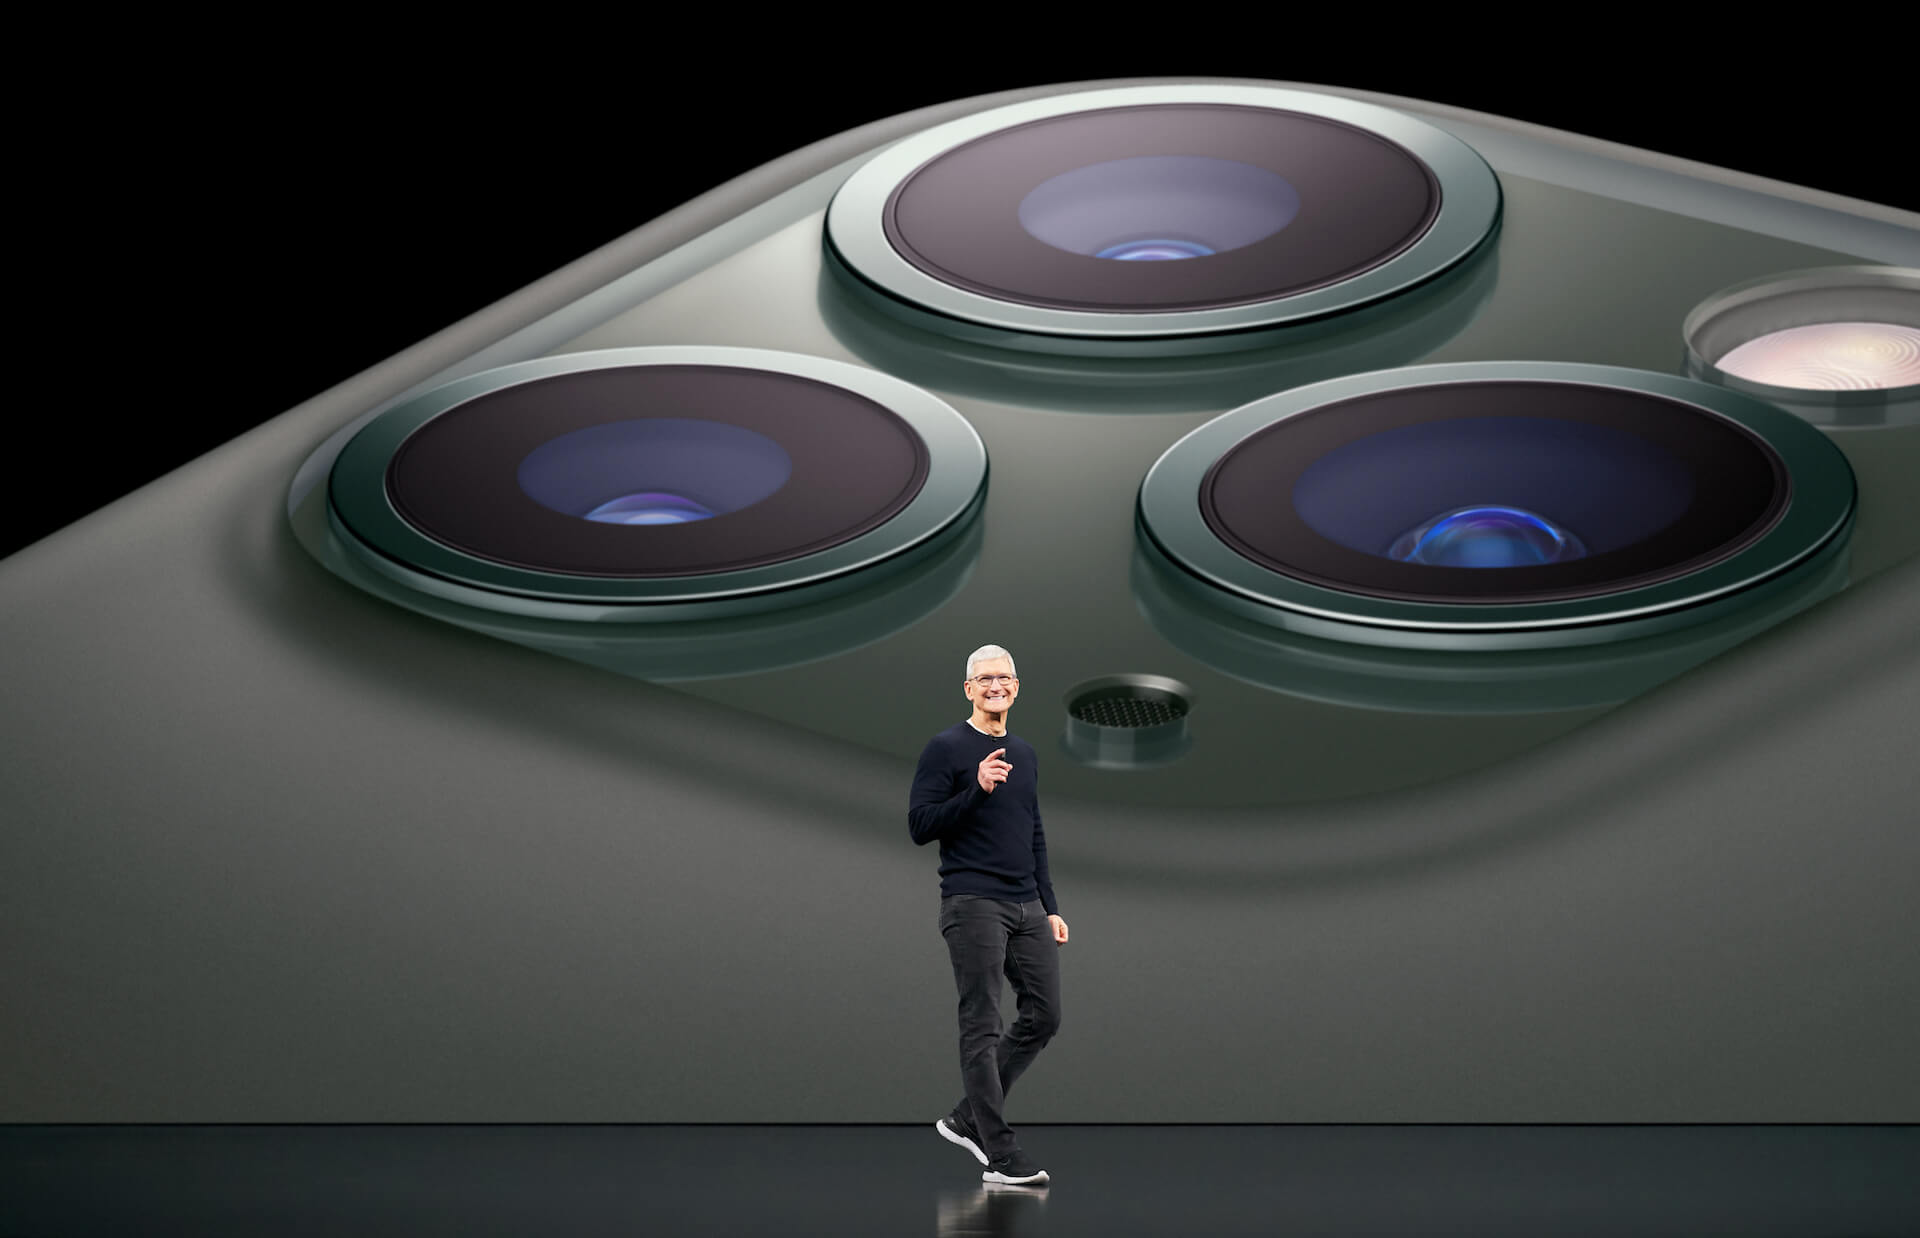 Apple、新型iPhoneを3月末に発表?4月3日に発売か|シザー式キーボード採用のMacBookなども登場? tech200218_apple_iphone_1